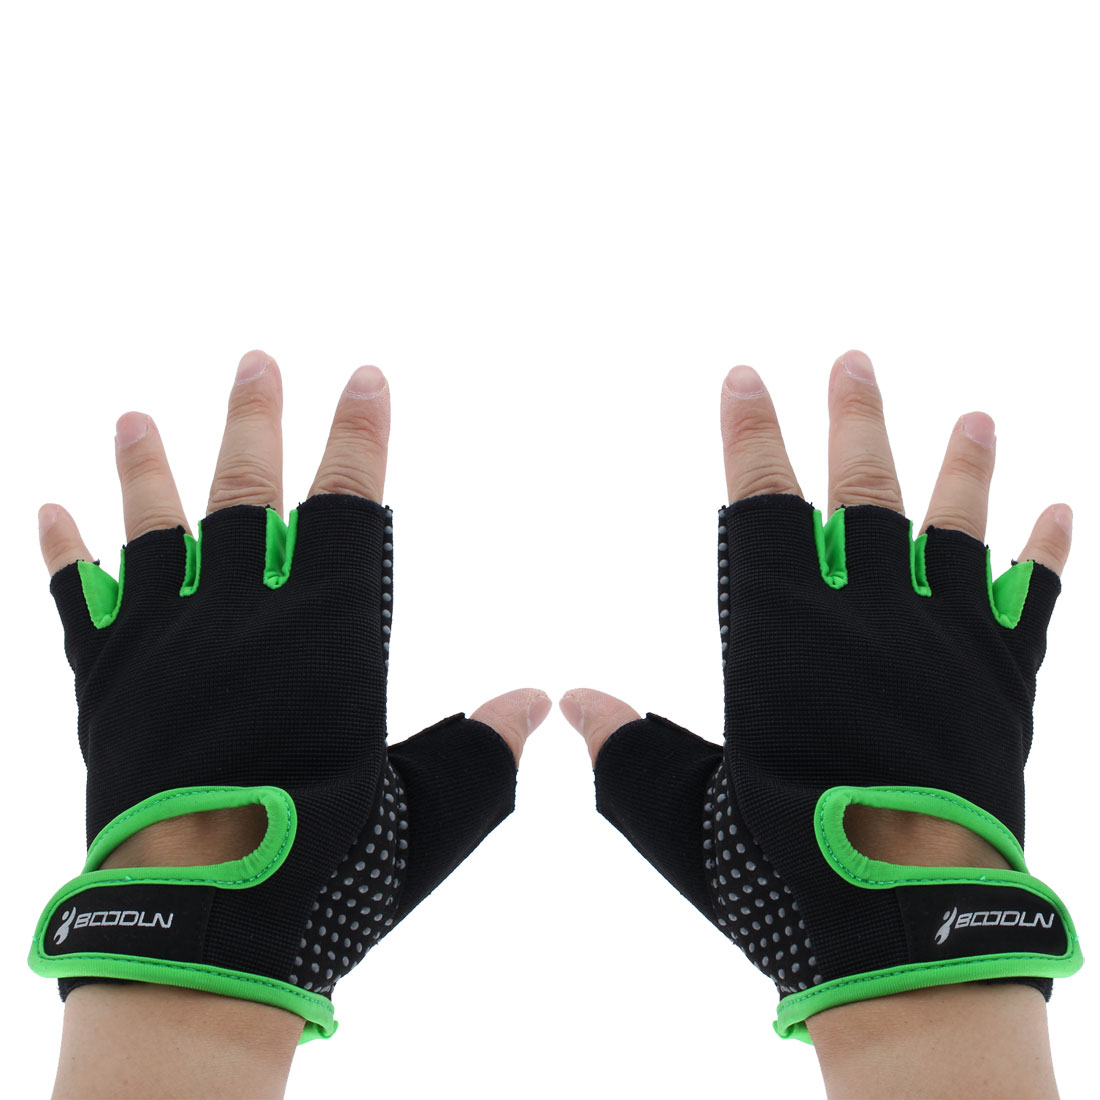 BOODUN Authorized Exercise Weight Biking Lifting Training Microfiber Non-slip Fitness Half Finger Gloves Green L